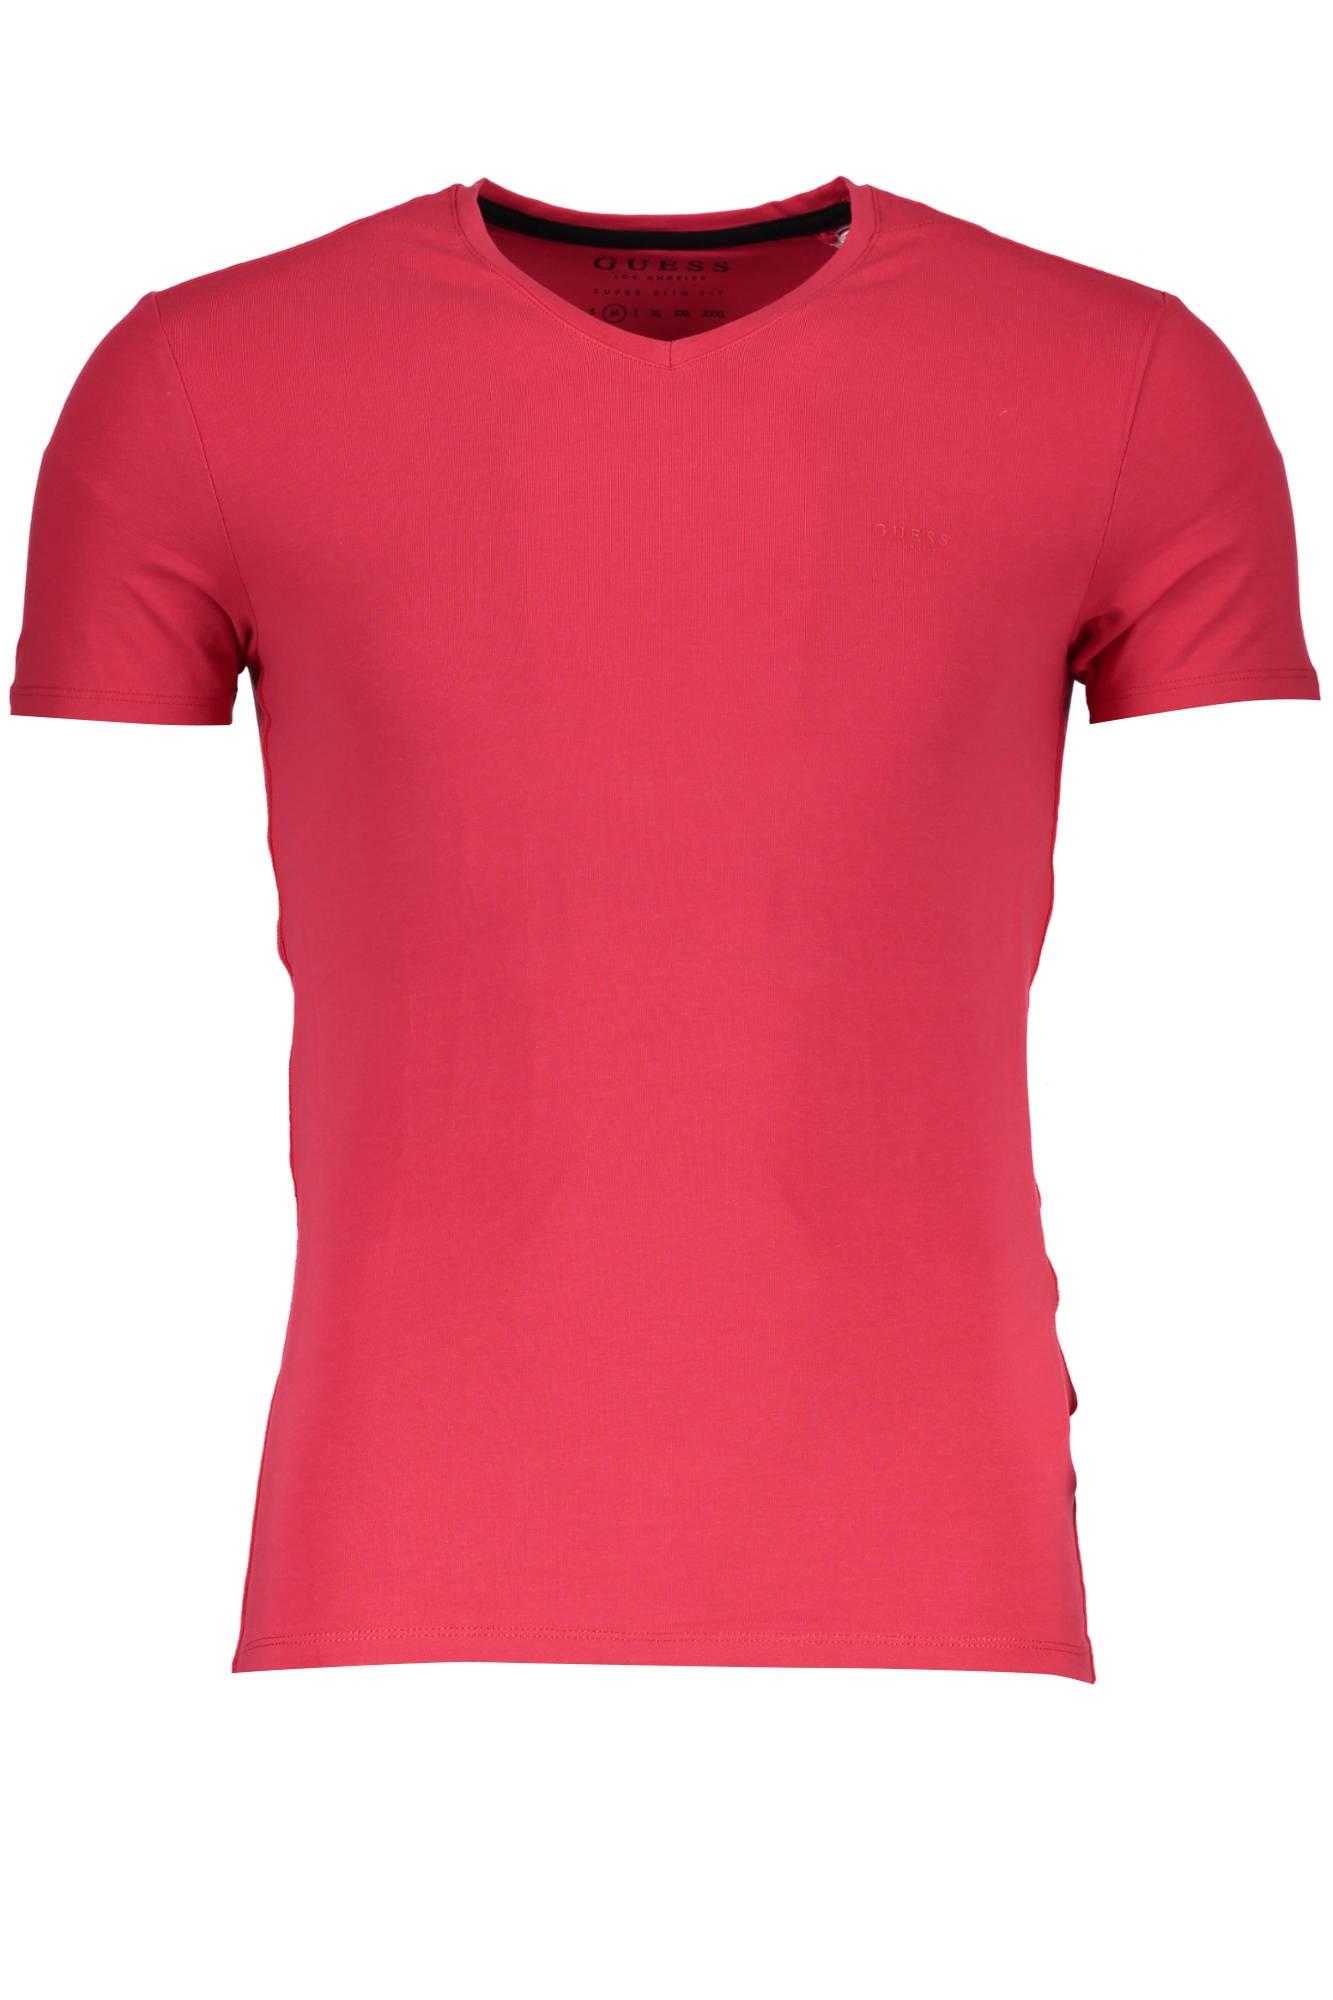 Camiseta Guess para hombre rojo